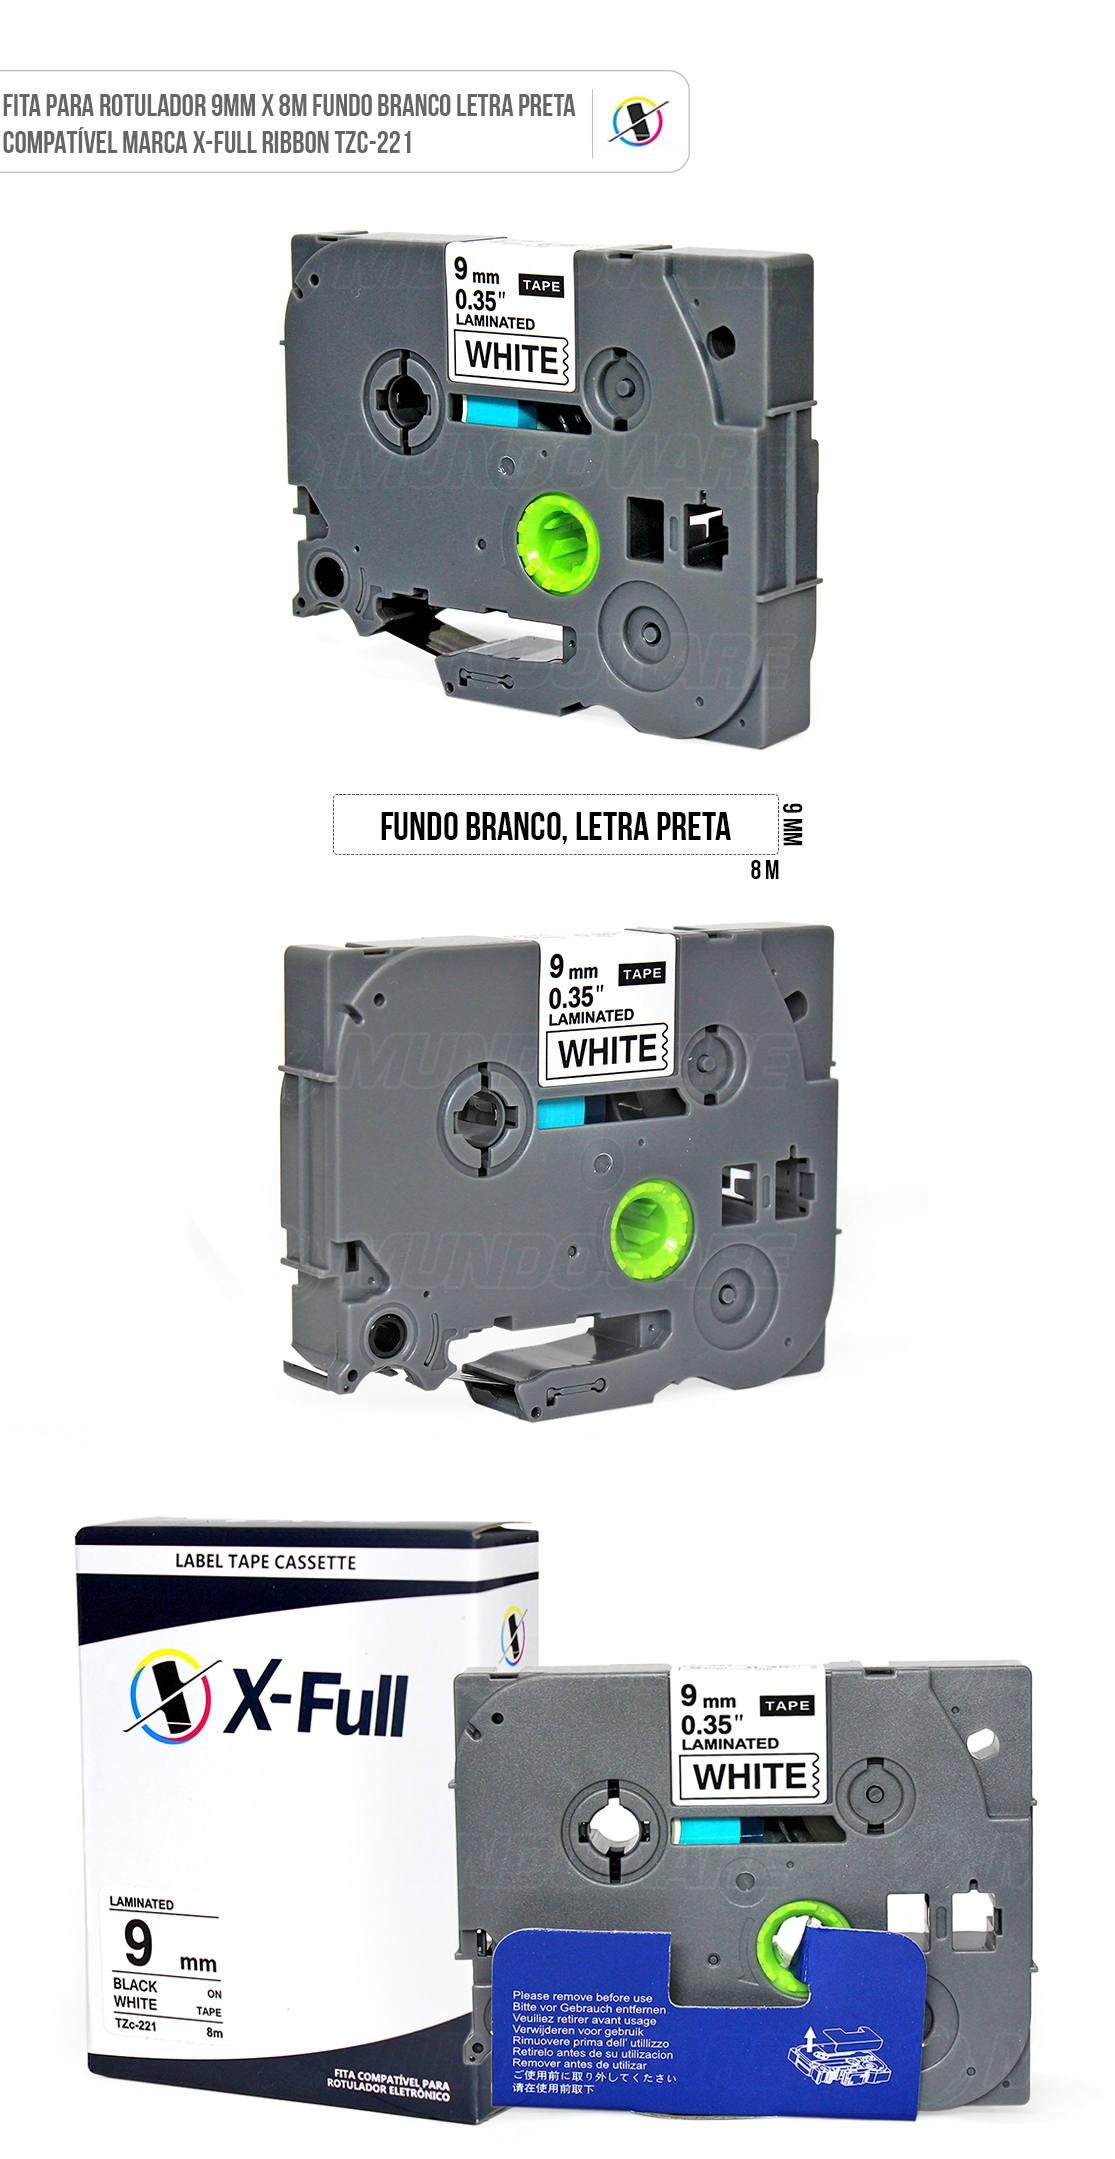 Fita Compatível para Rotulador Marca X-Full Referência TZc-221 TZ-221 TZe-221 Ribbon 9mm x 8m Branco/Preto para Brother